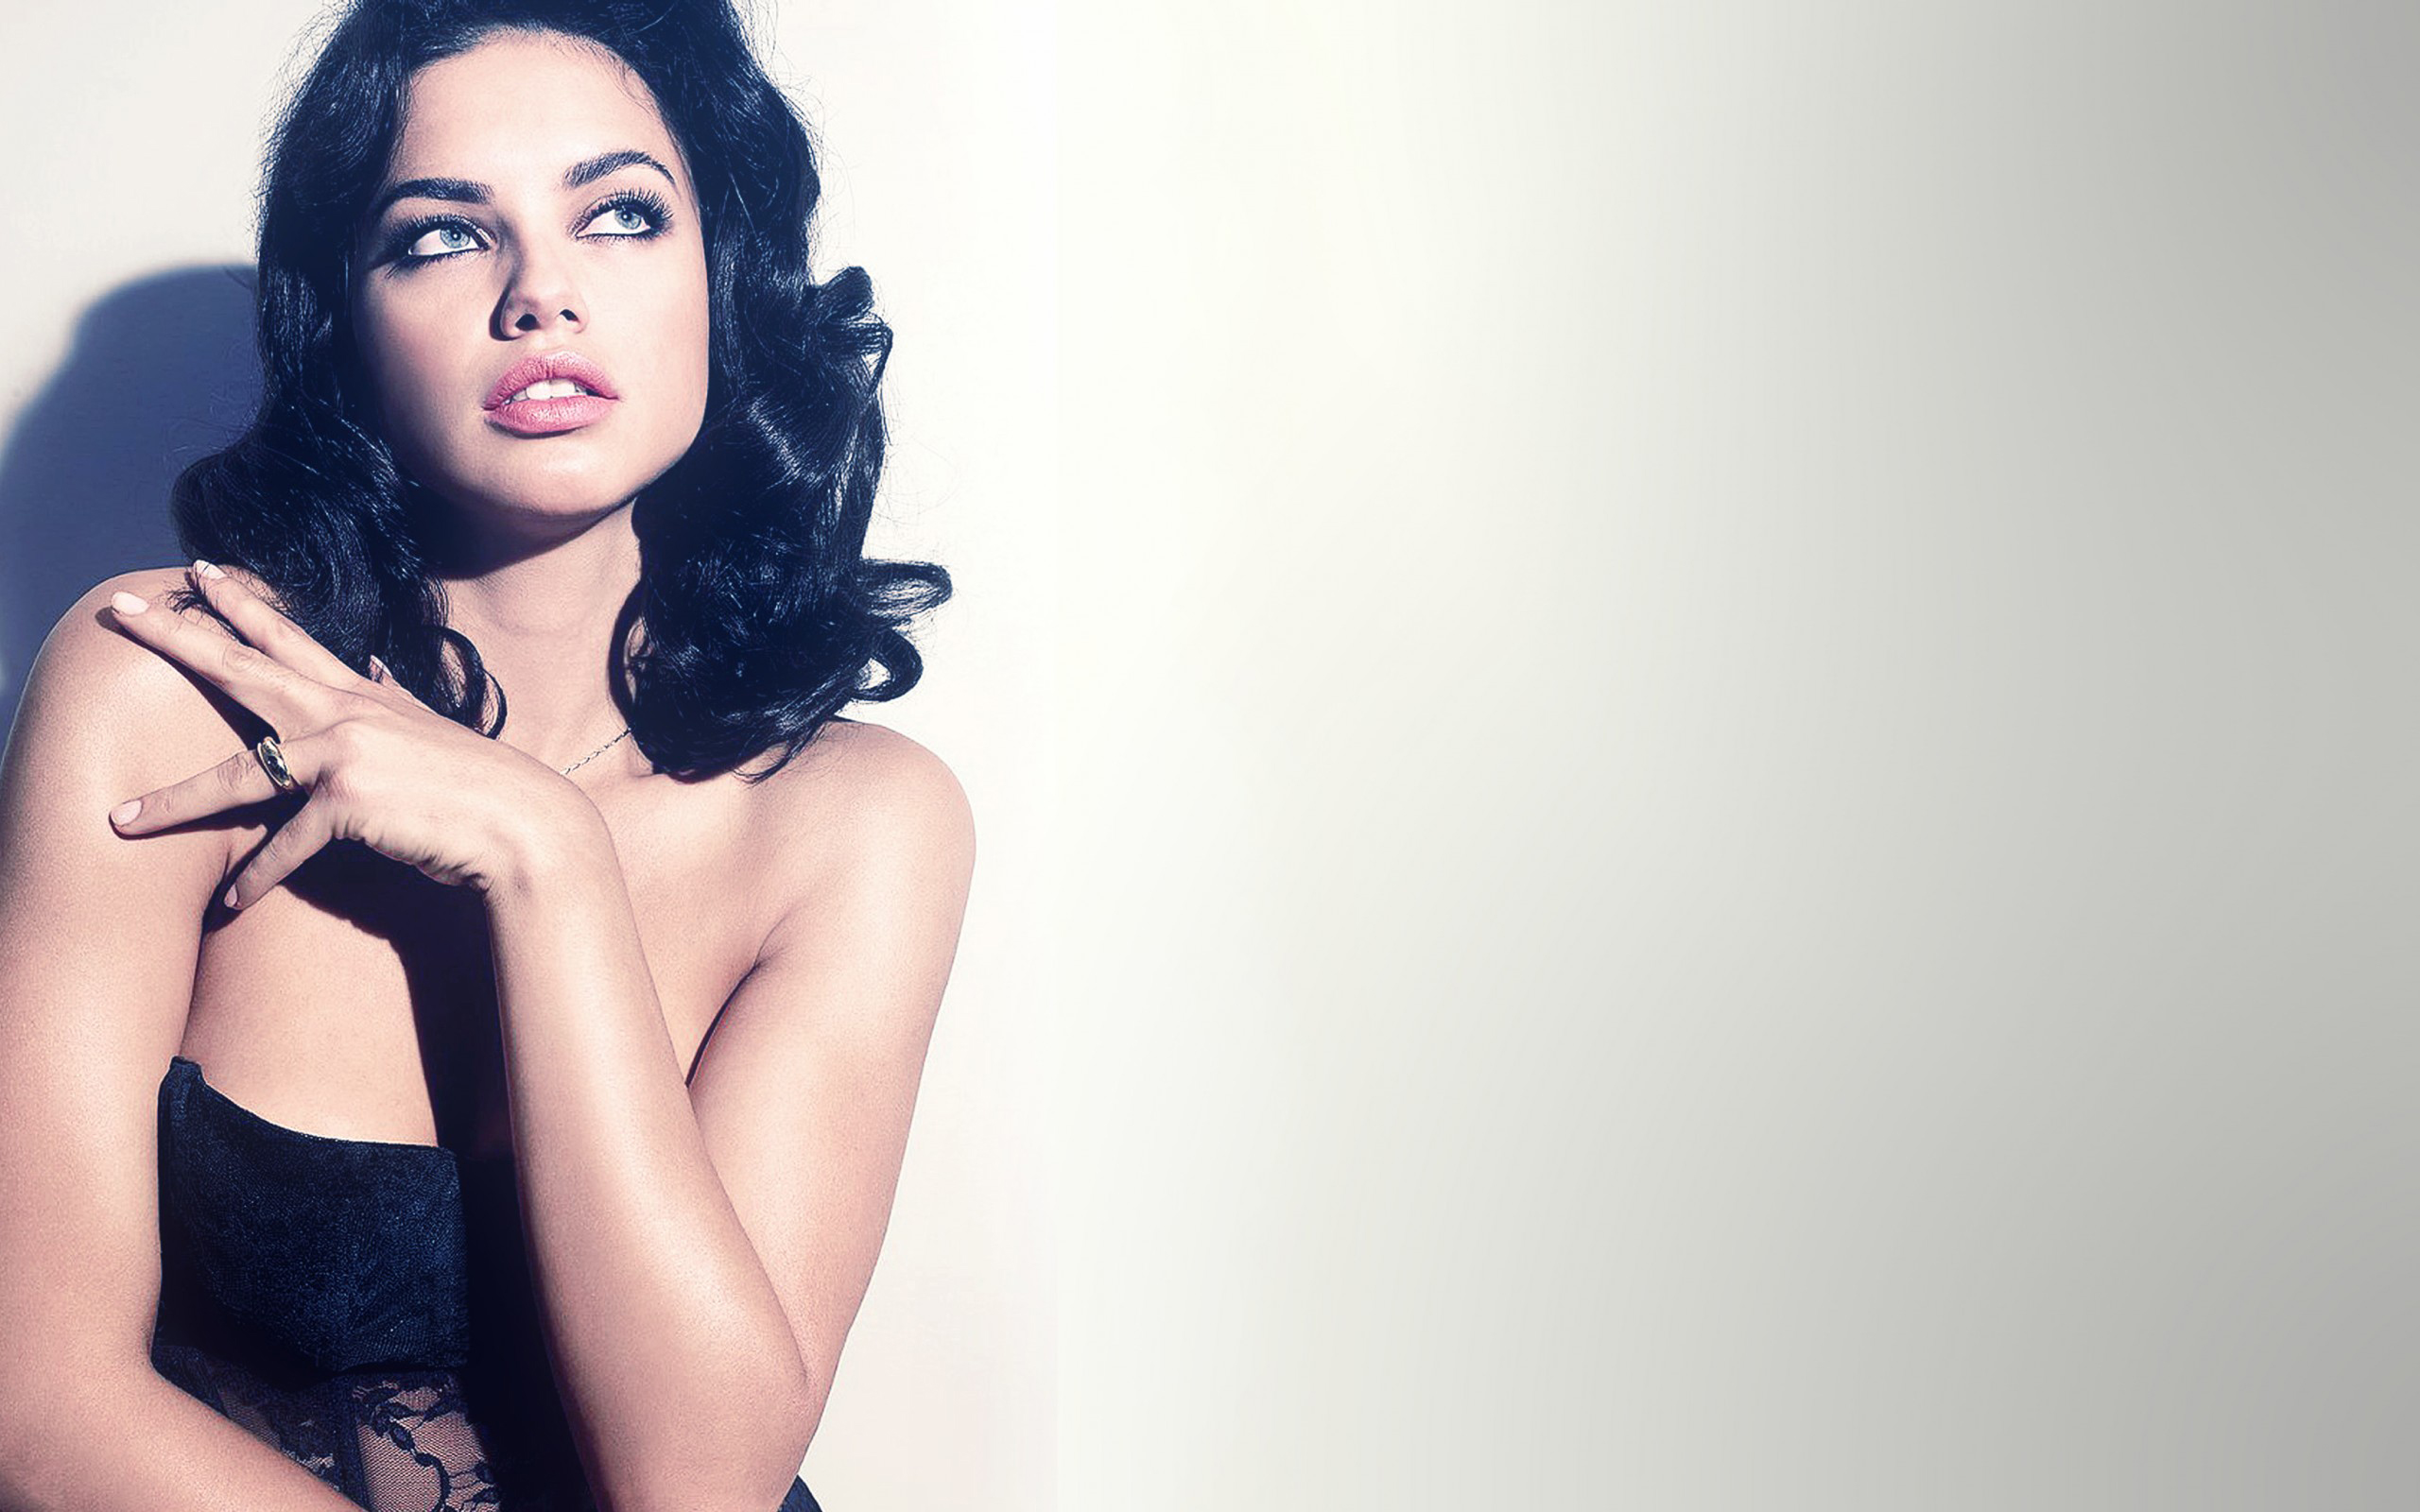 Download Adriana Lima Classy Photoshoot 5120x2880 Resolution Full